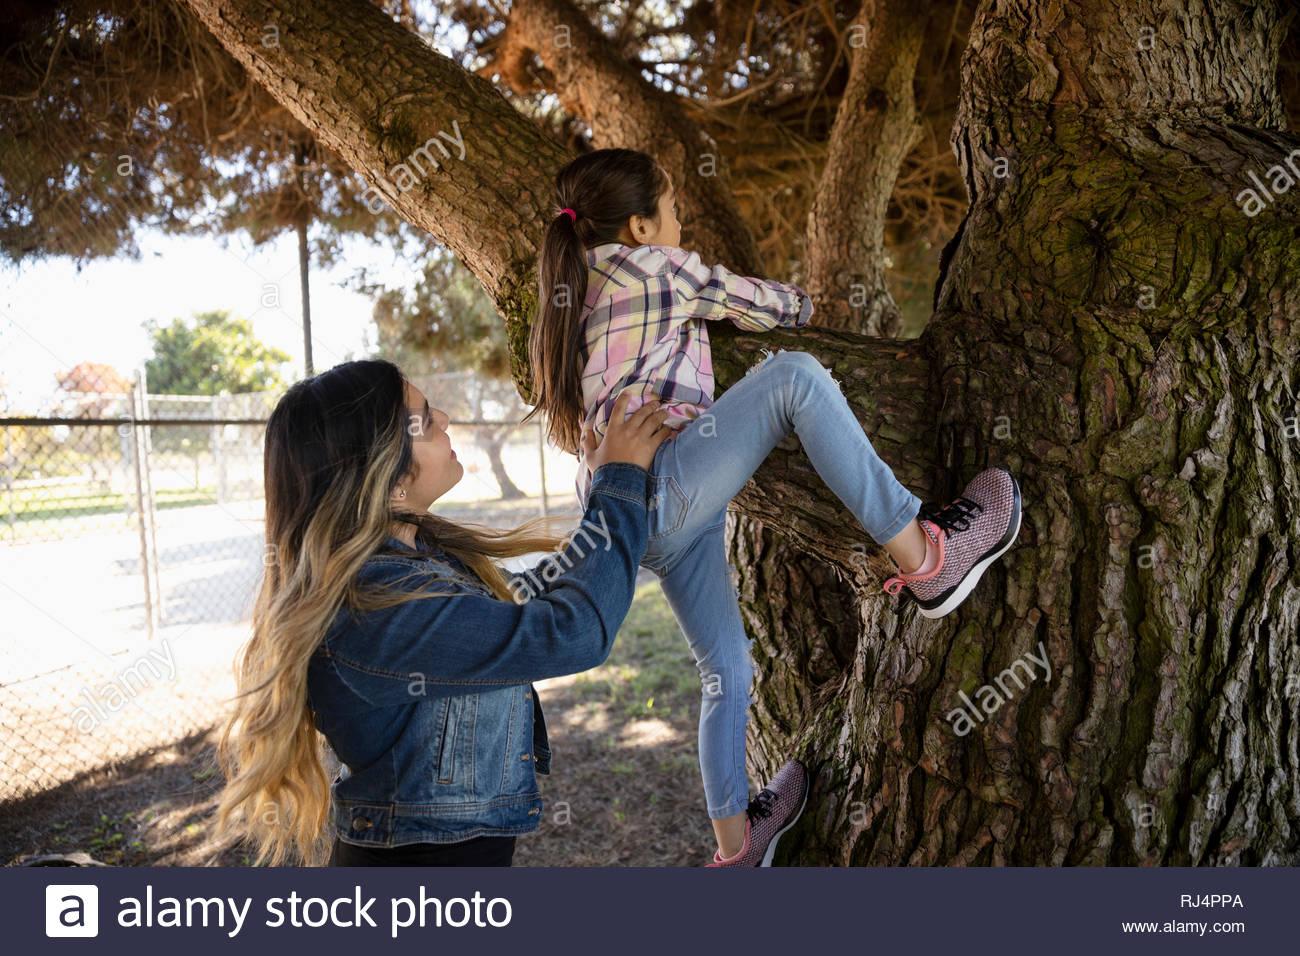 Latinx sisters climbing tree in park - Stock Image